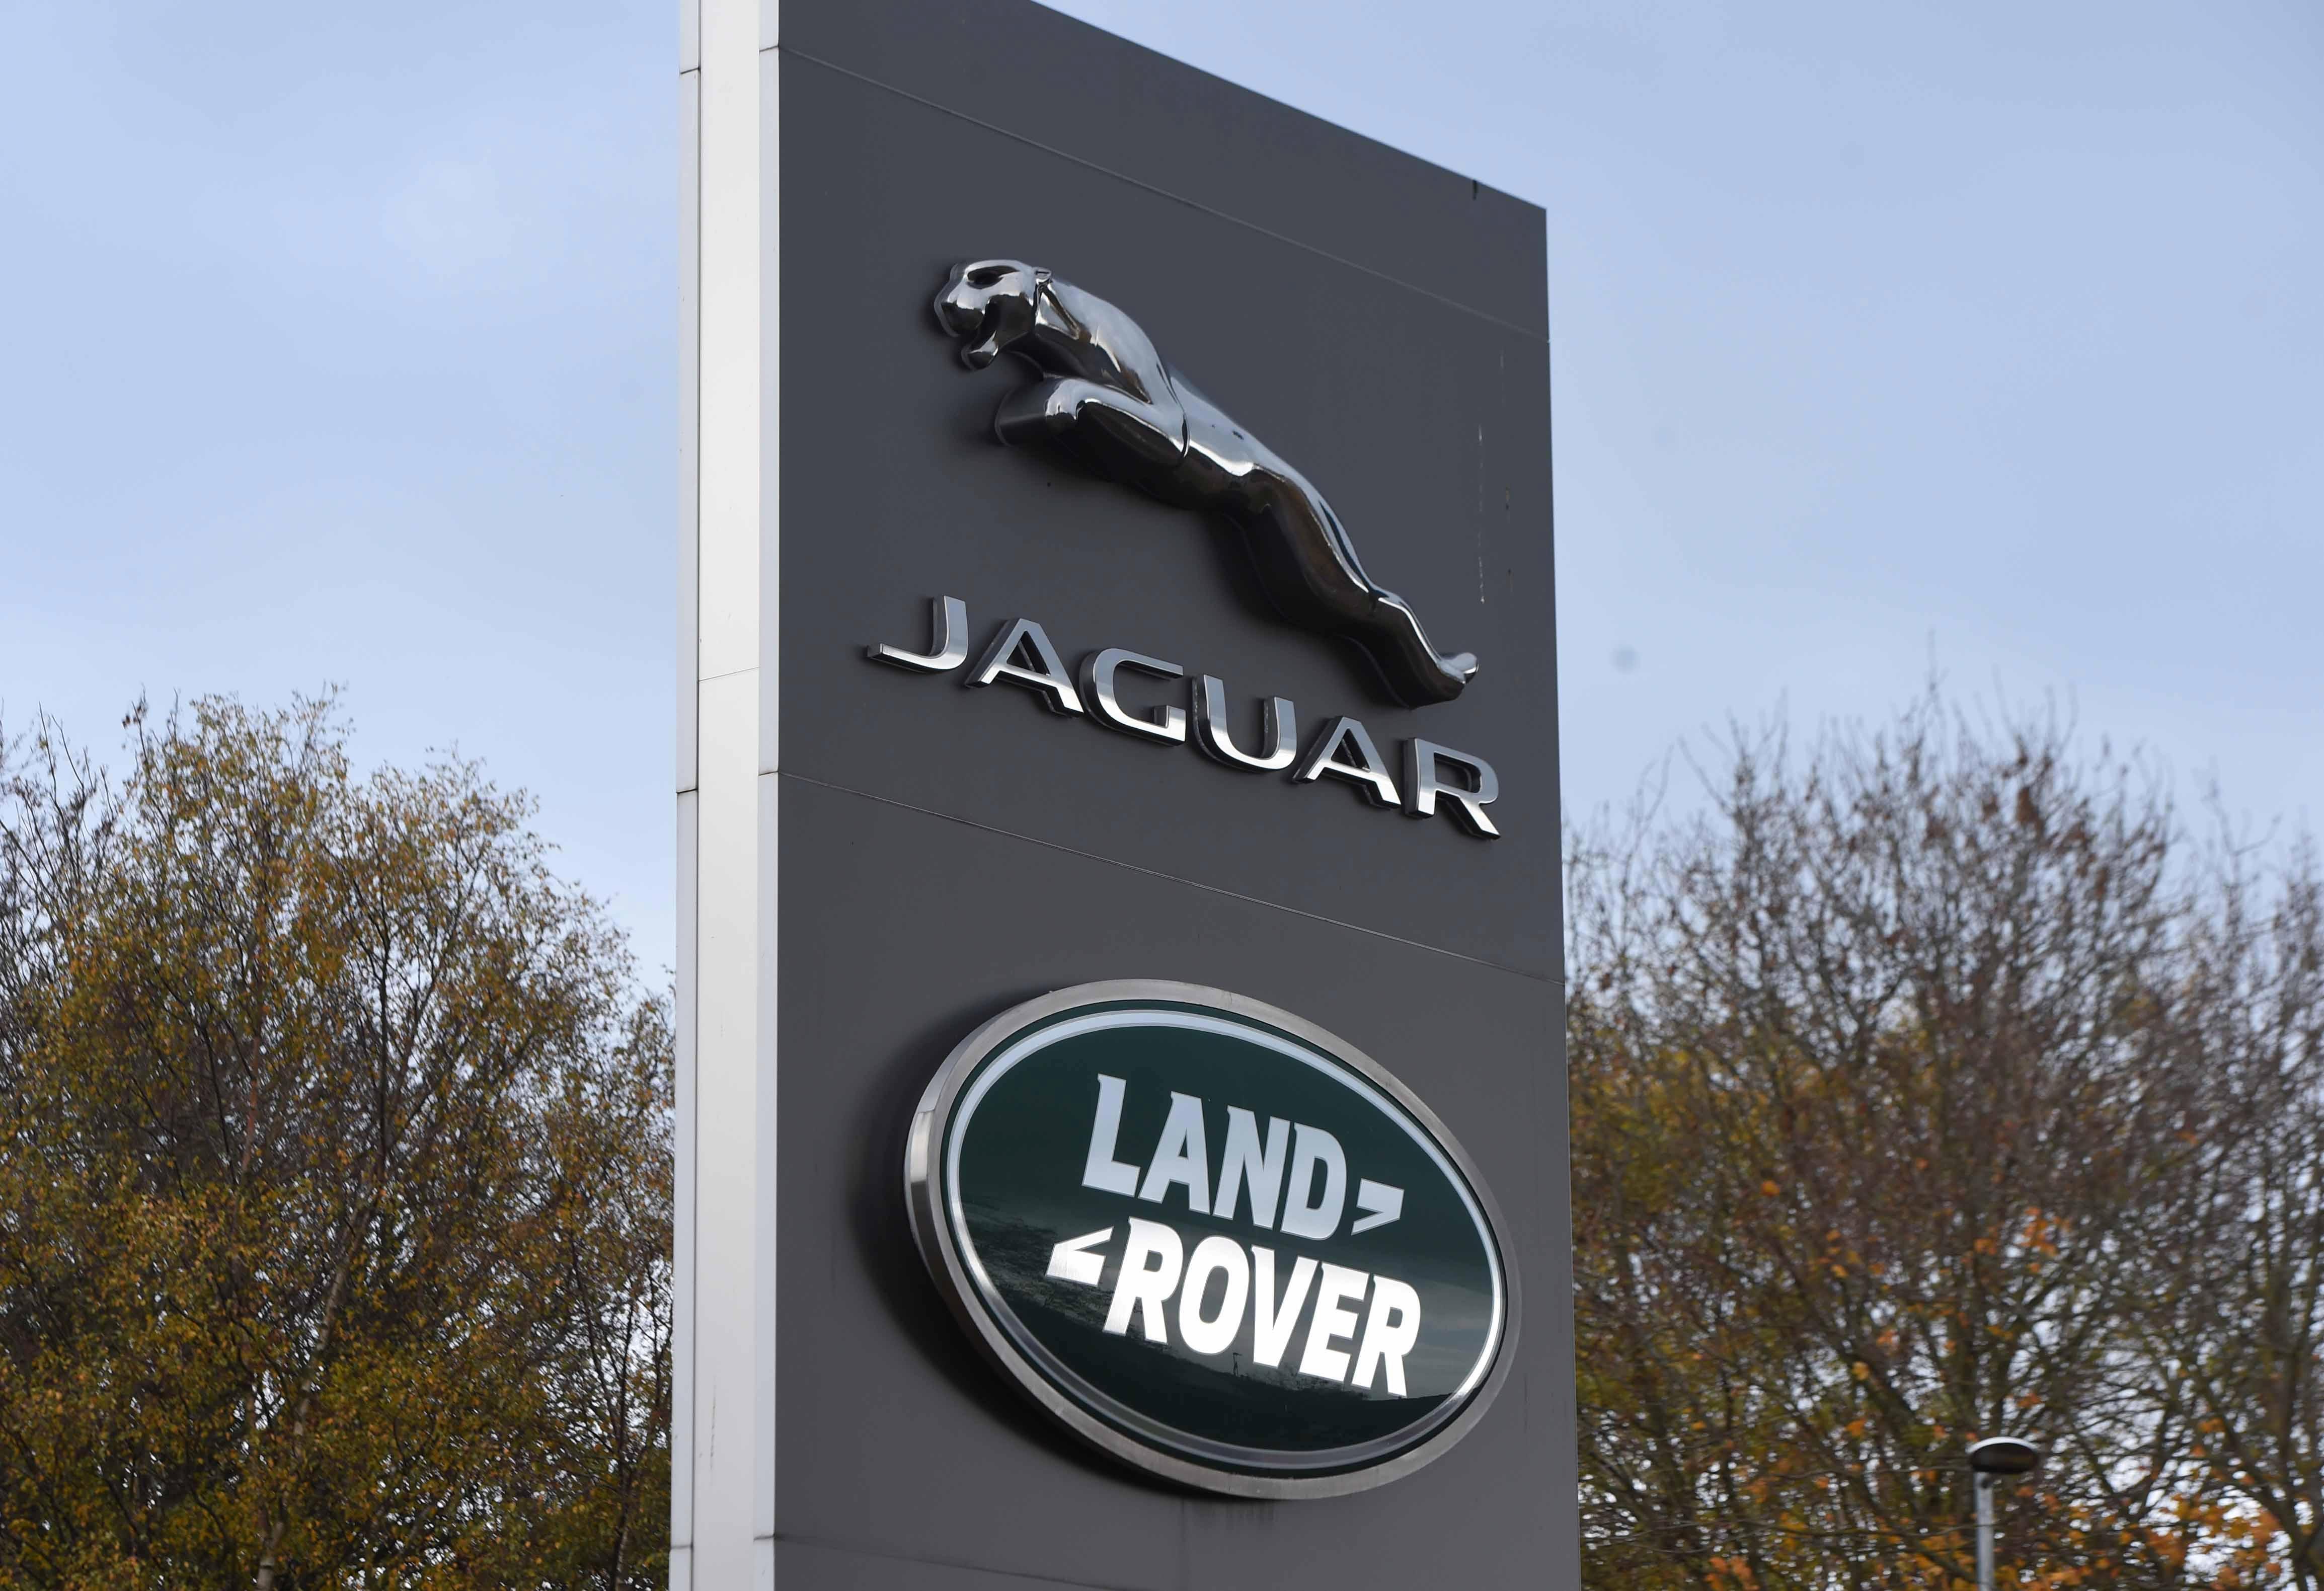 Jaguar Land Rover to cut 5,000 jobs as demand for diesel cars falls